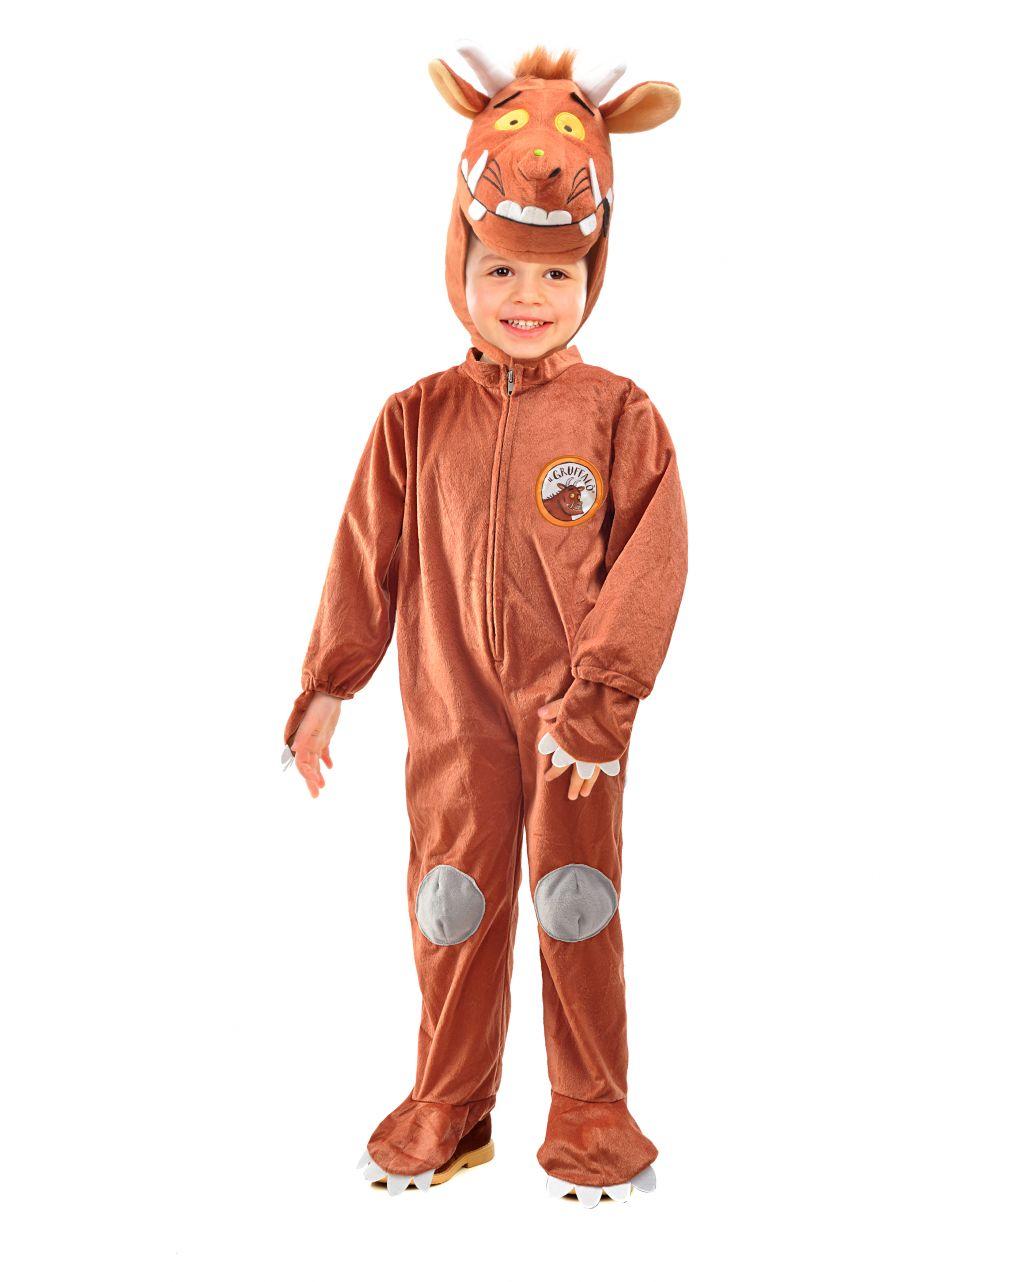 Gruffalo' costume (tutina e cufietta) (tg. 2- 3 anni) - Ciao